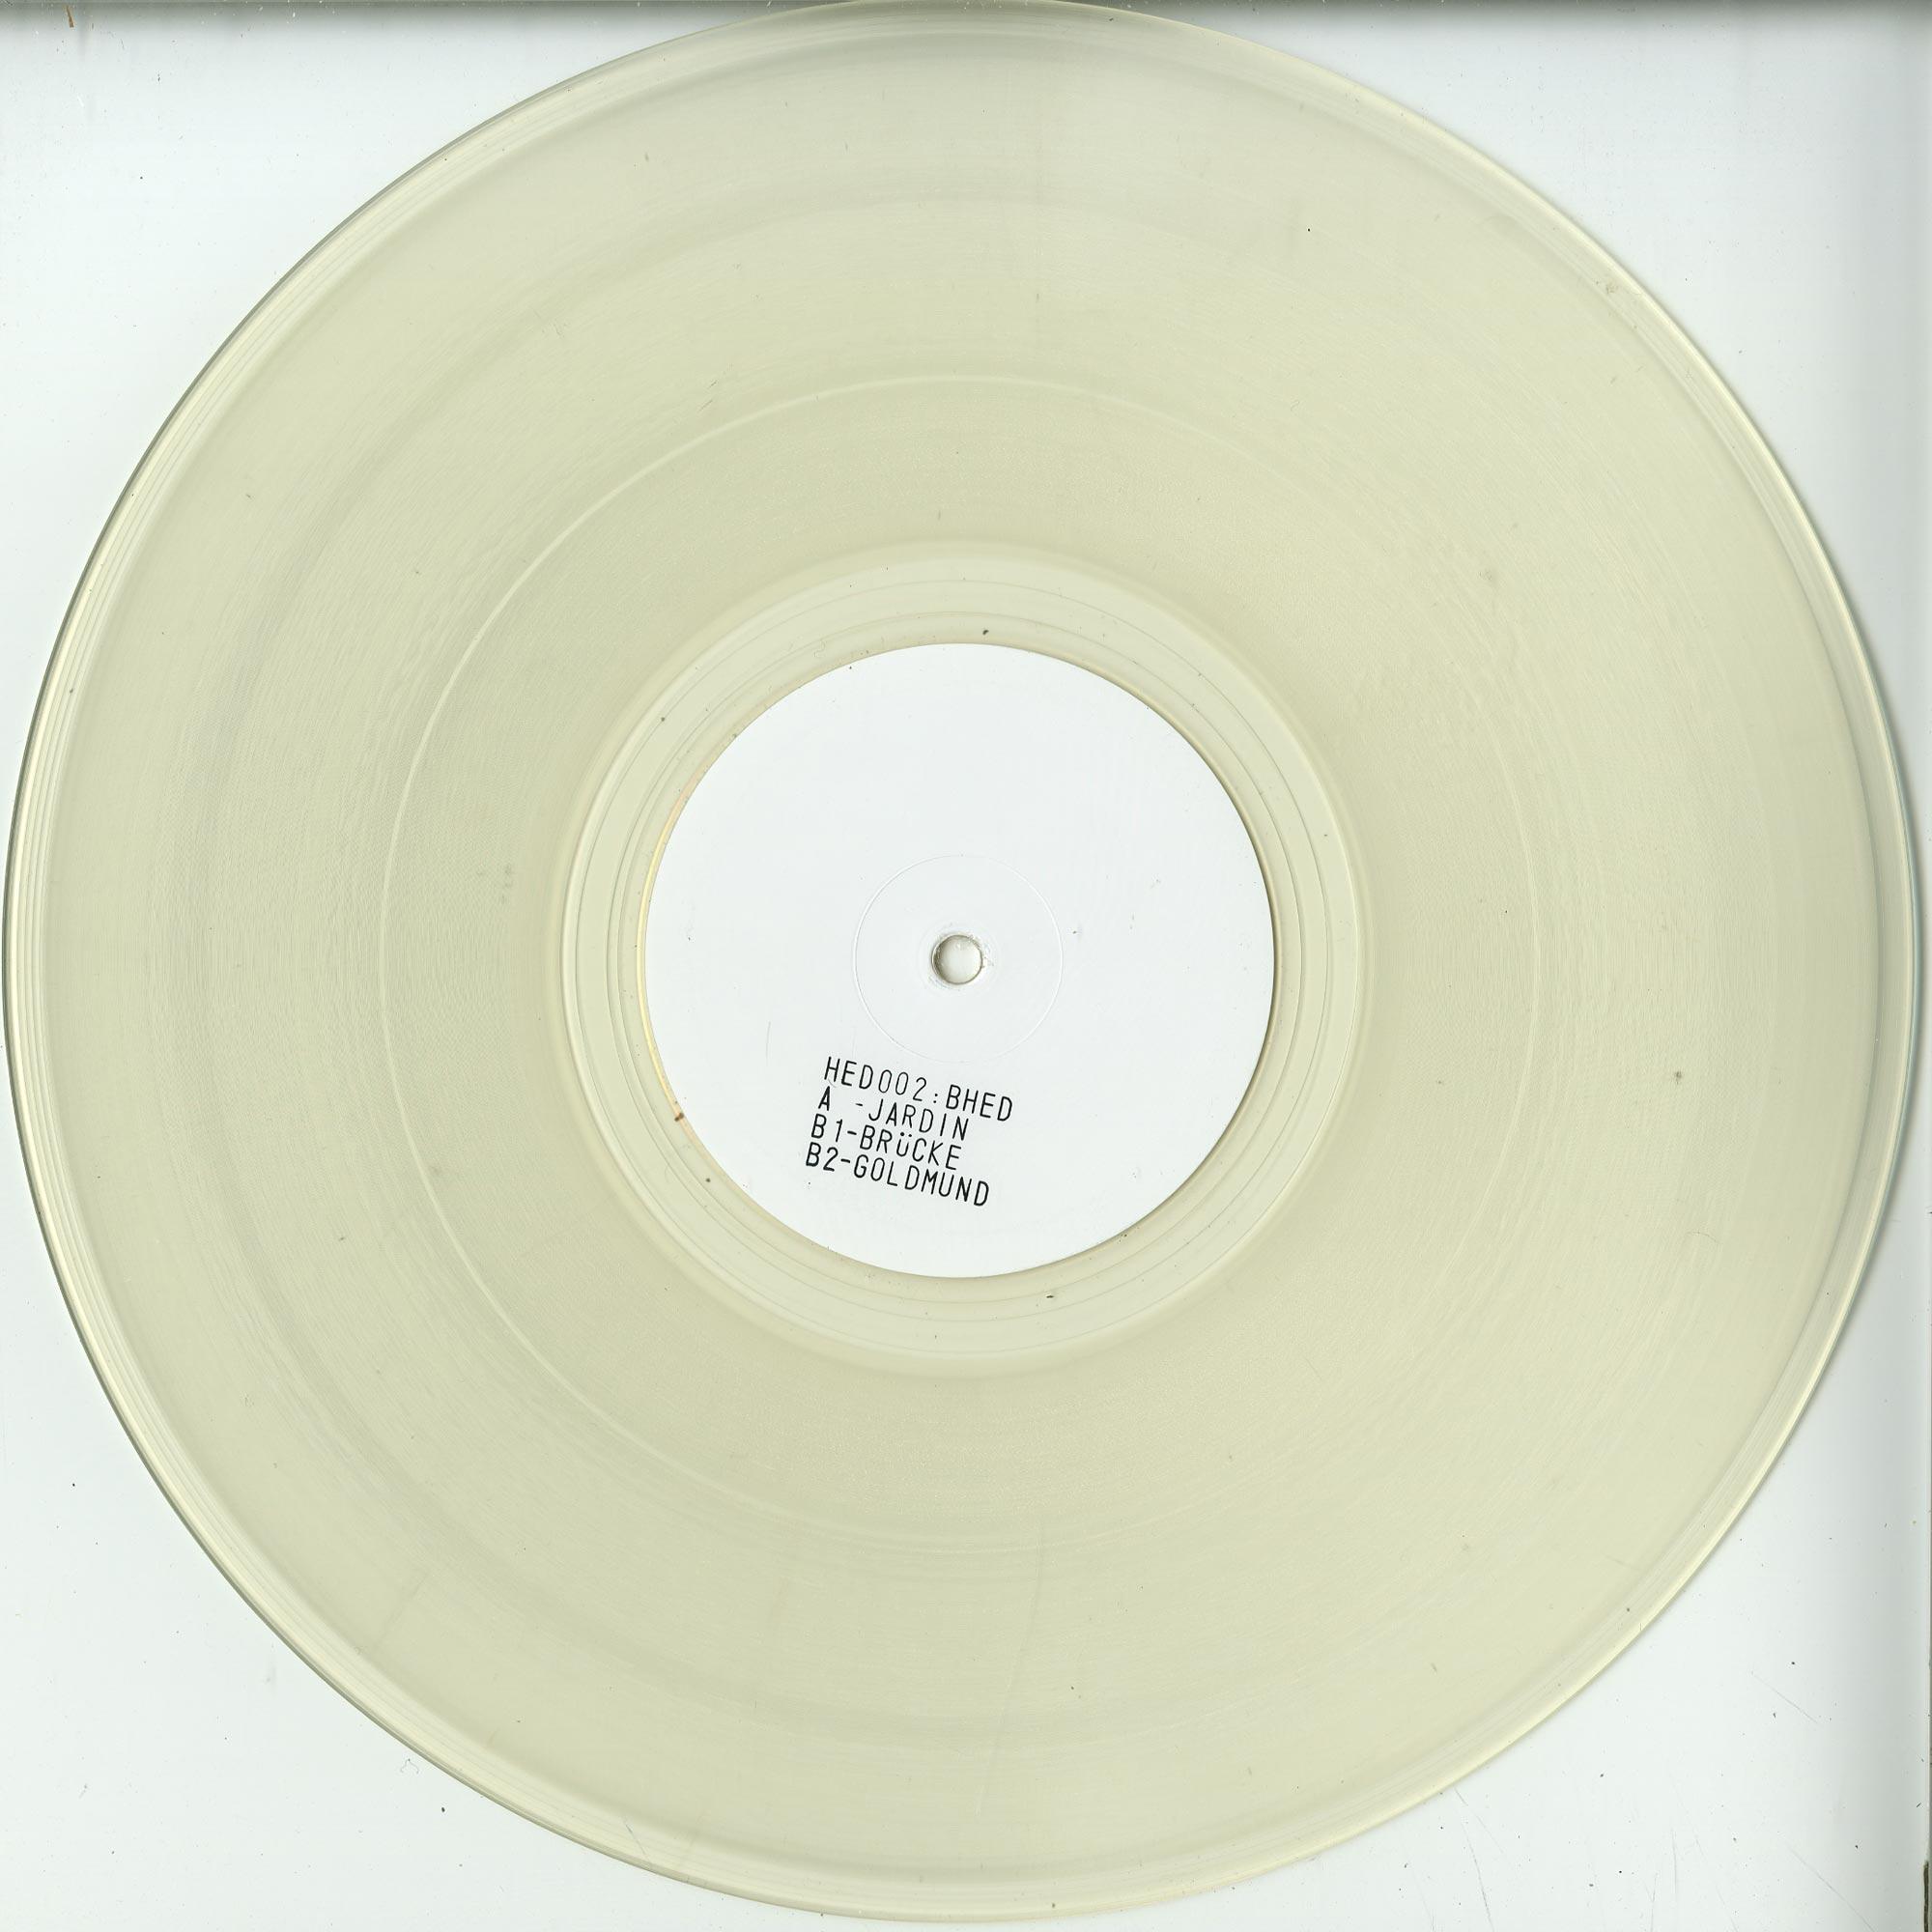 Bhed - GOLDMUND EP